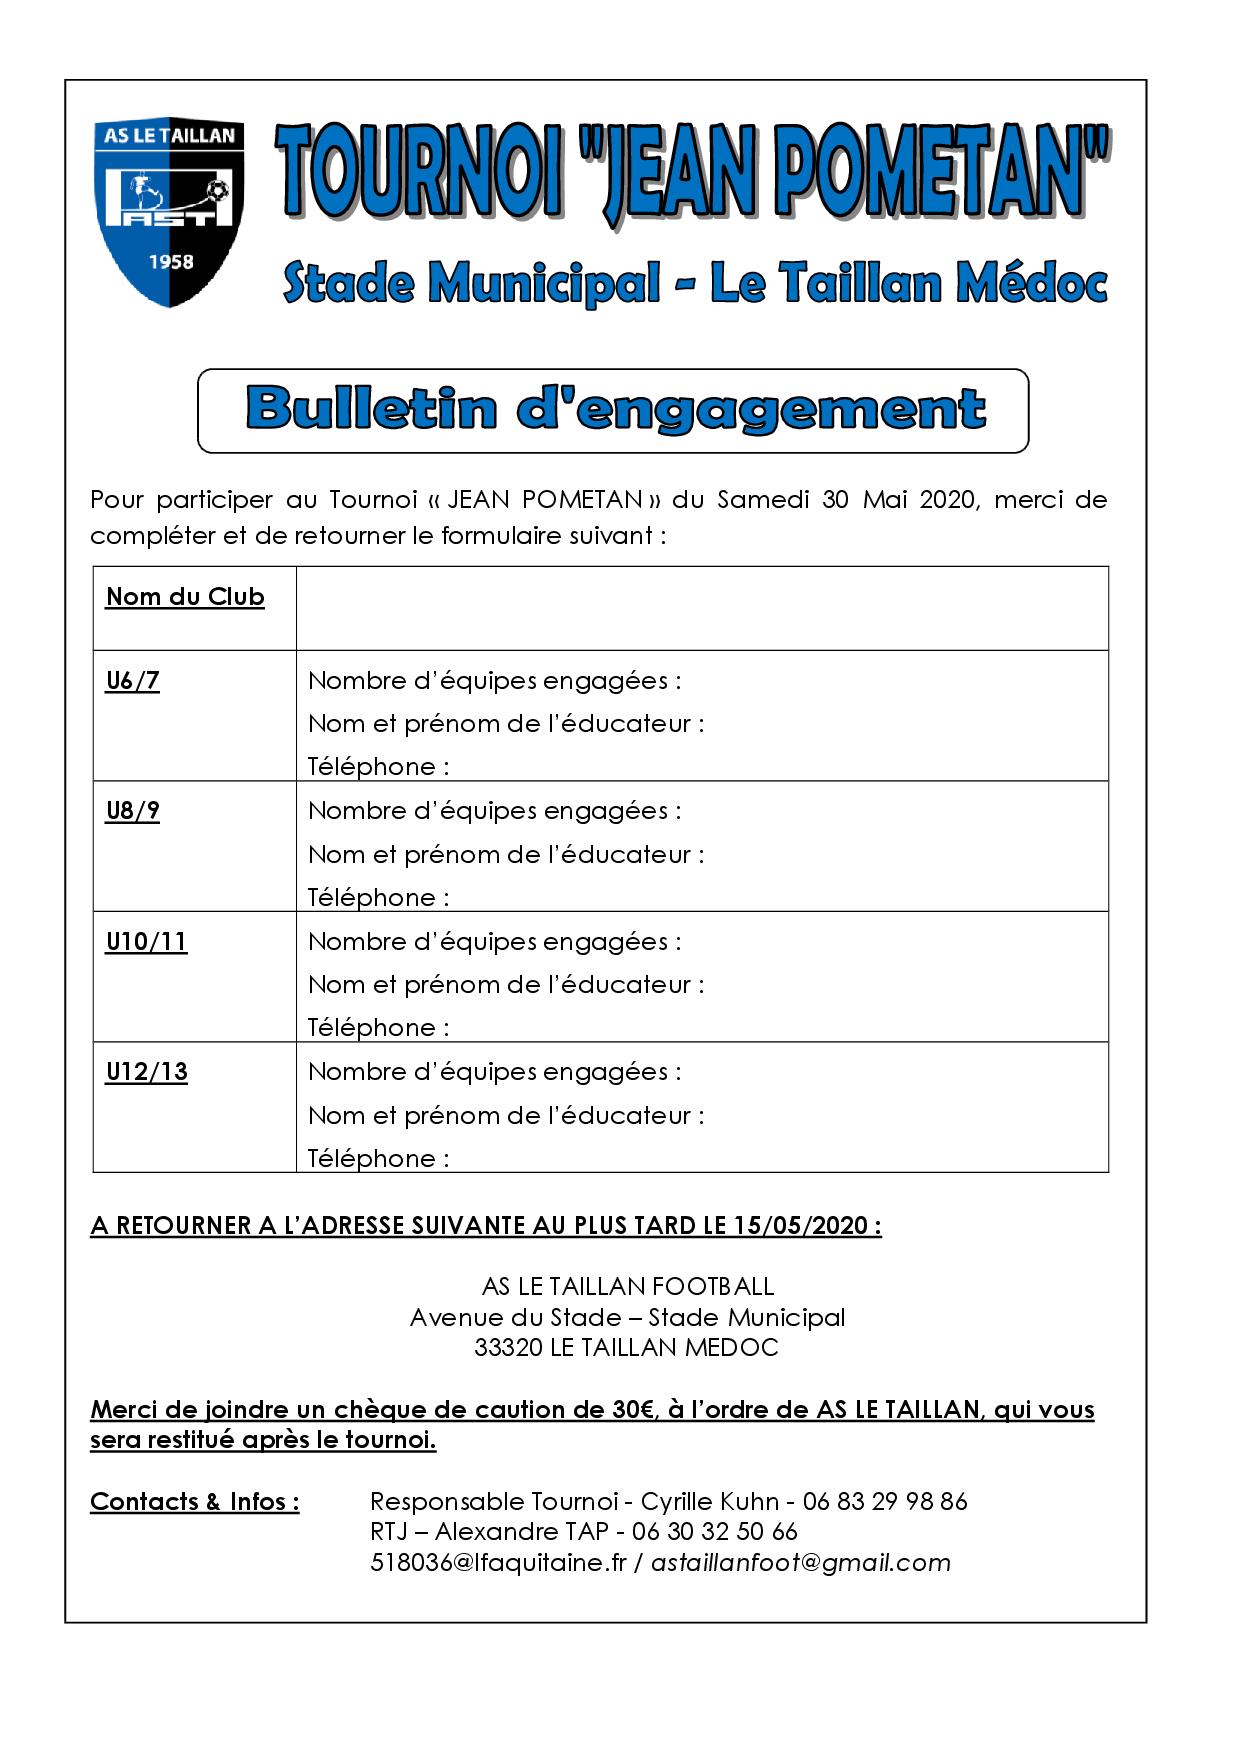 BULLETIN ENGAGEMENT TOURNOI AST 2020.png